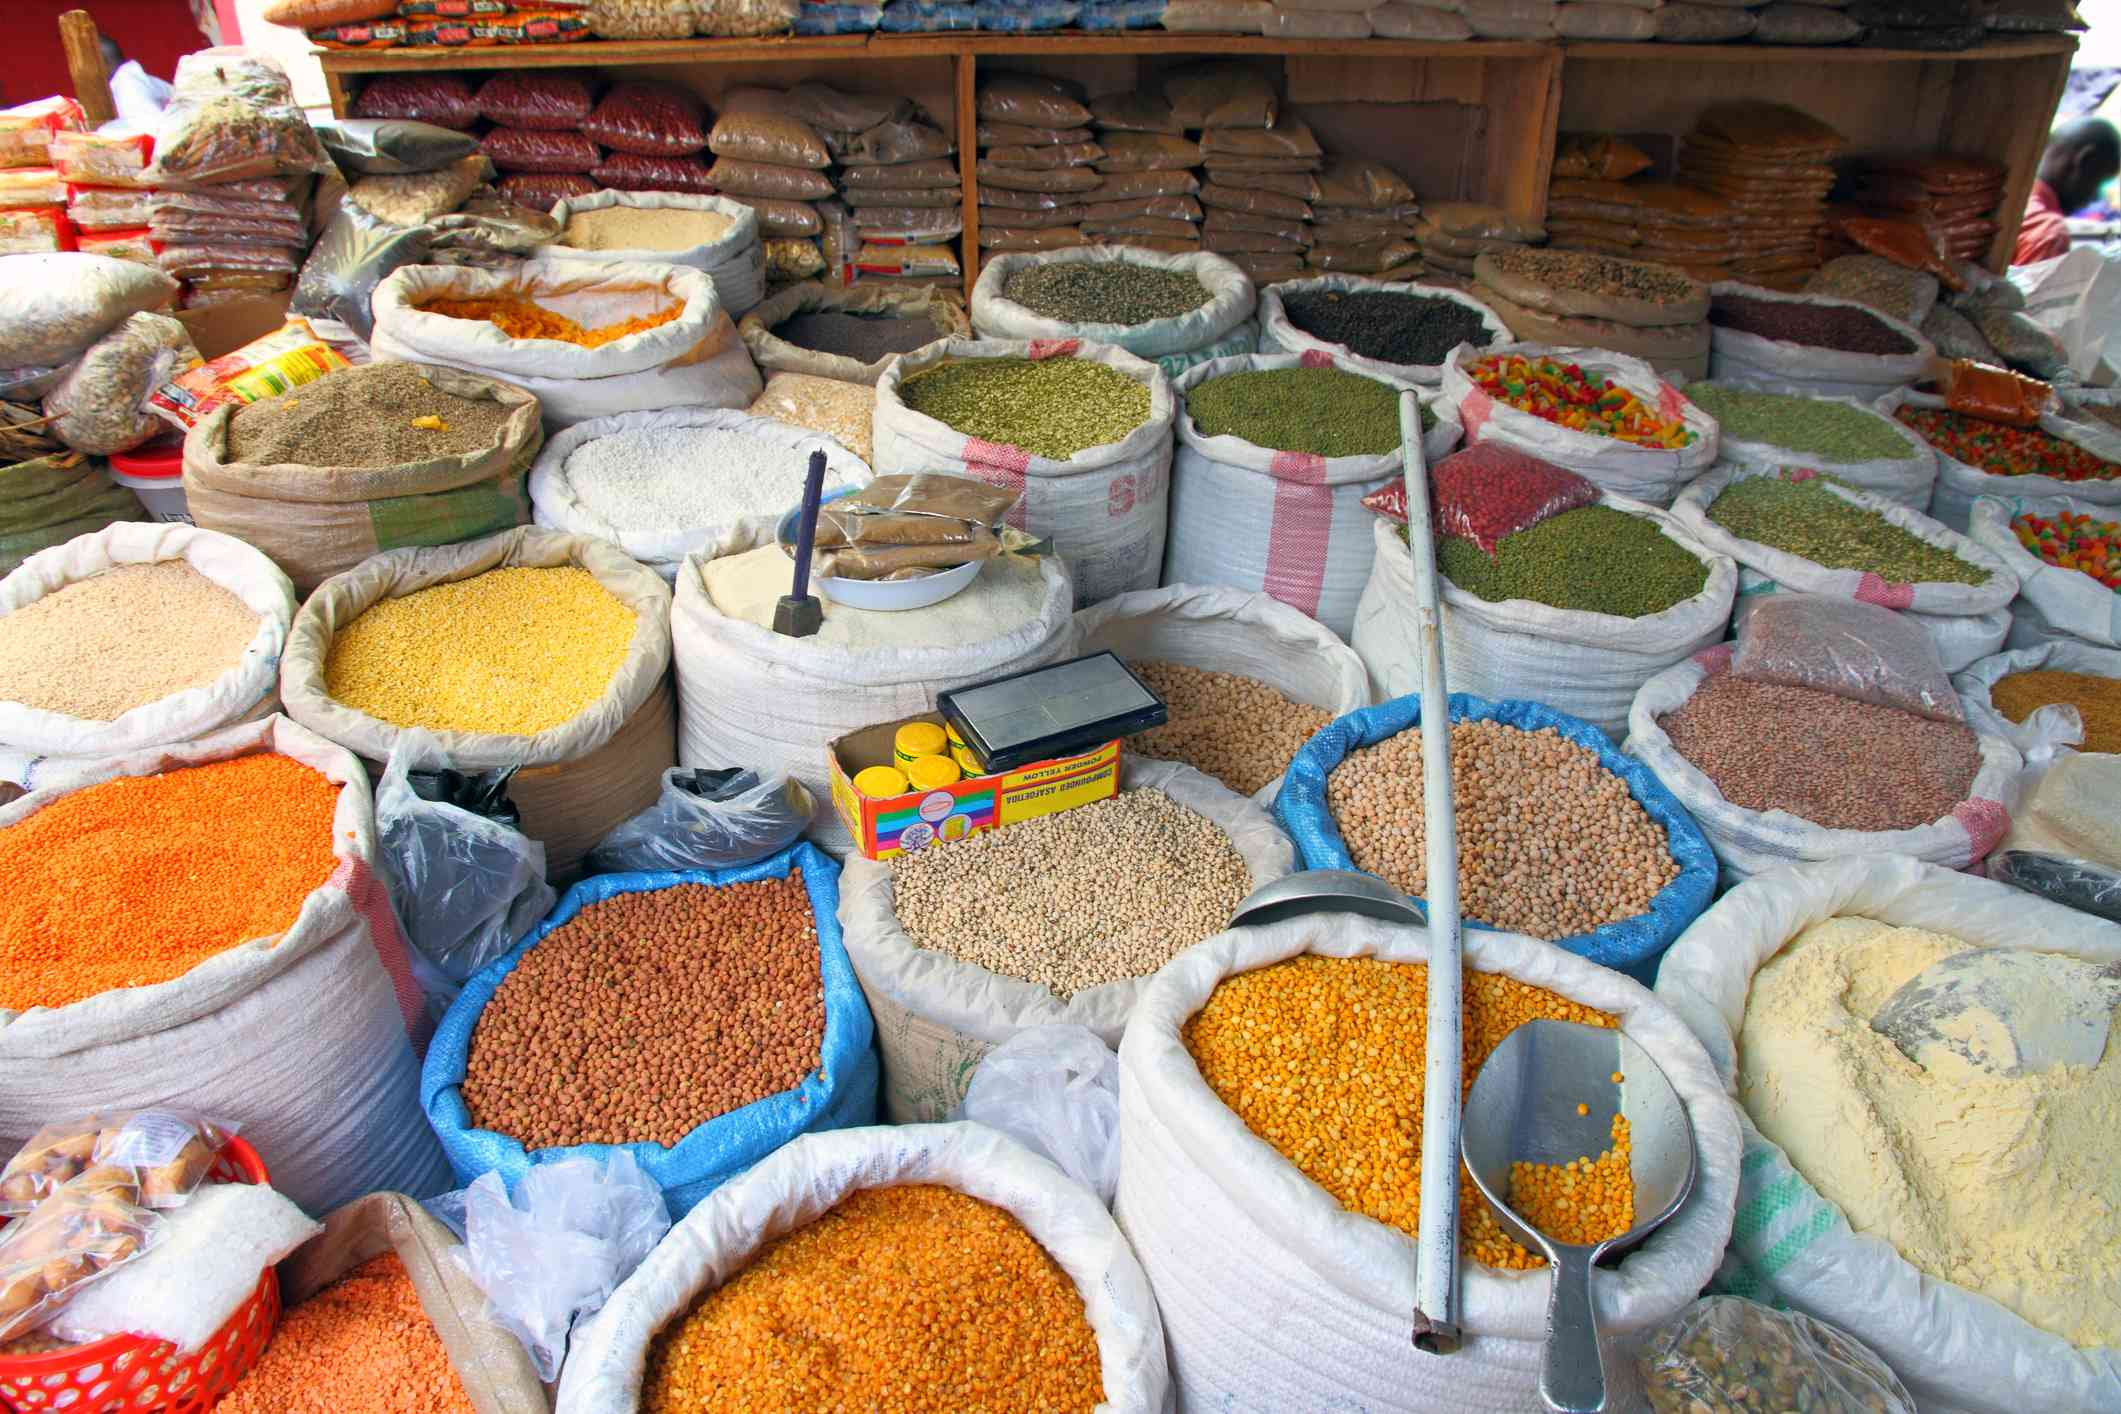 Bags of Market Food Staples